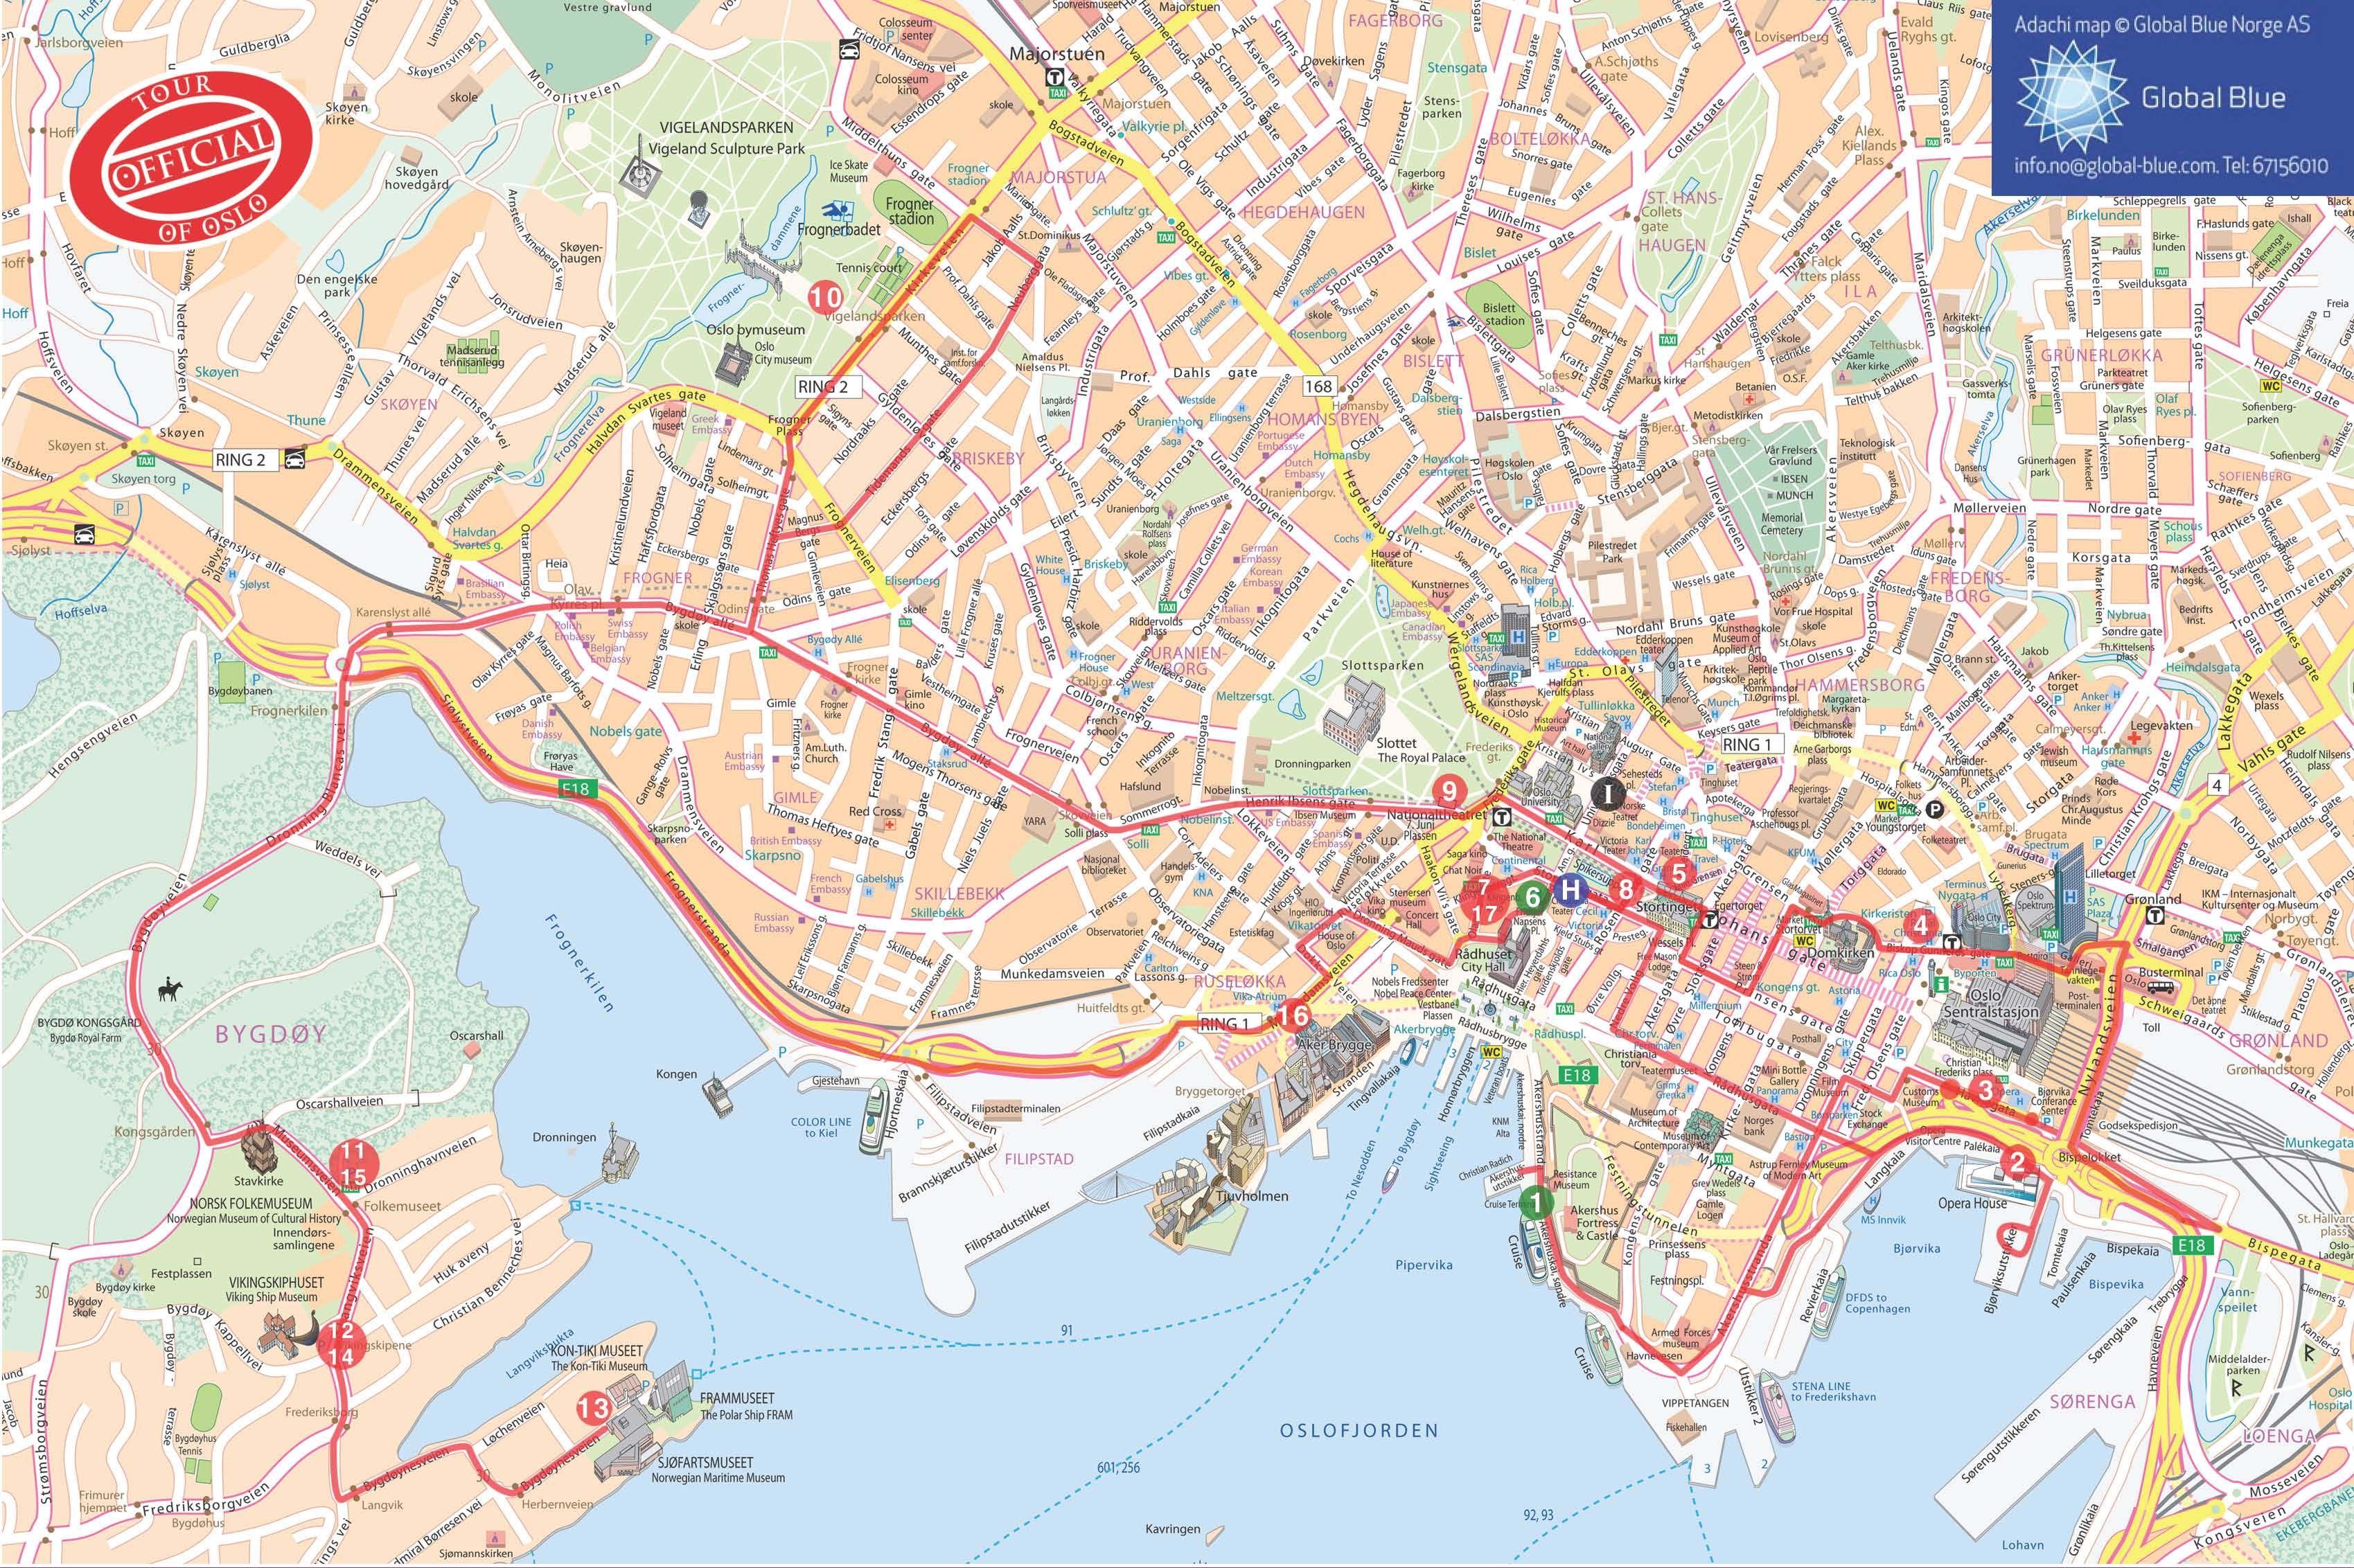 oslo rygge kart oslo tourist map   Google Search | Oslo | Pinterest | Tourist map  oslo rygge kart